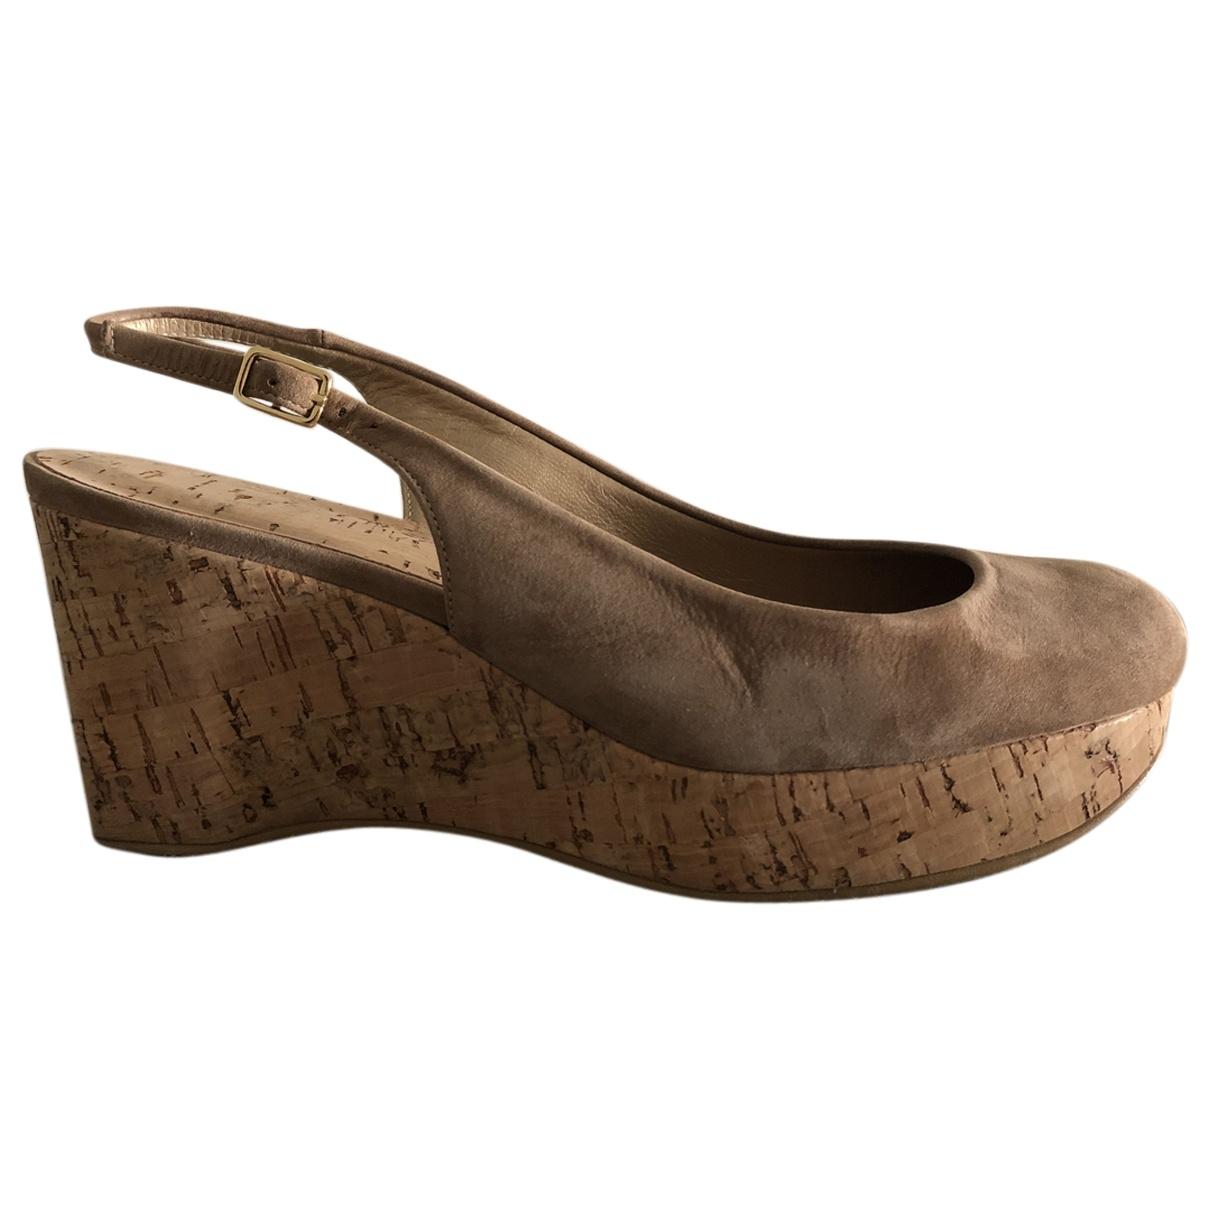 Stuart Weitzman \N Camel Leather Heels for Women 36 EU